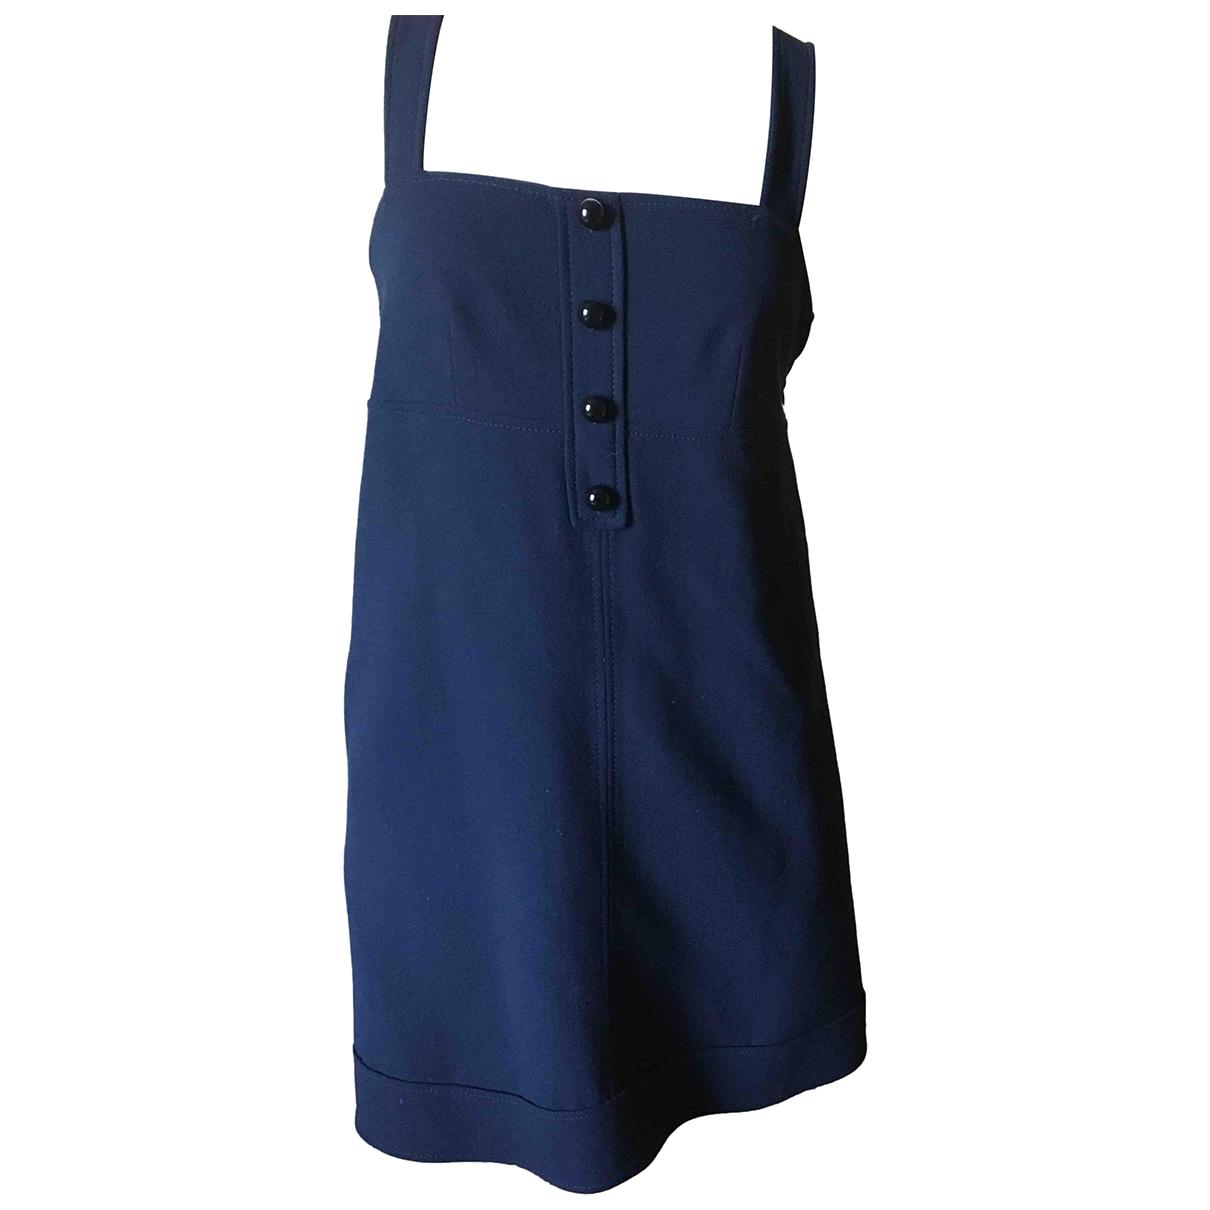 Derek Lam \N Navy Wool dress for Women 38 FR